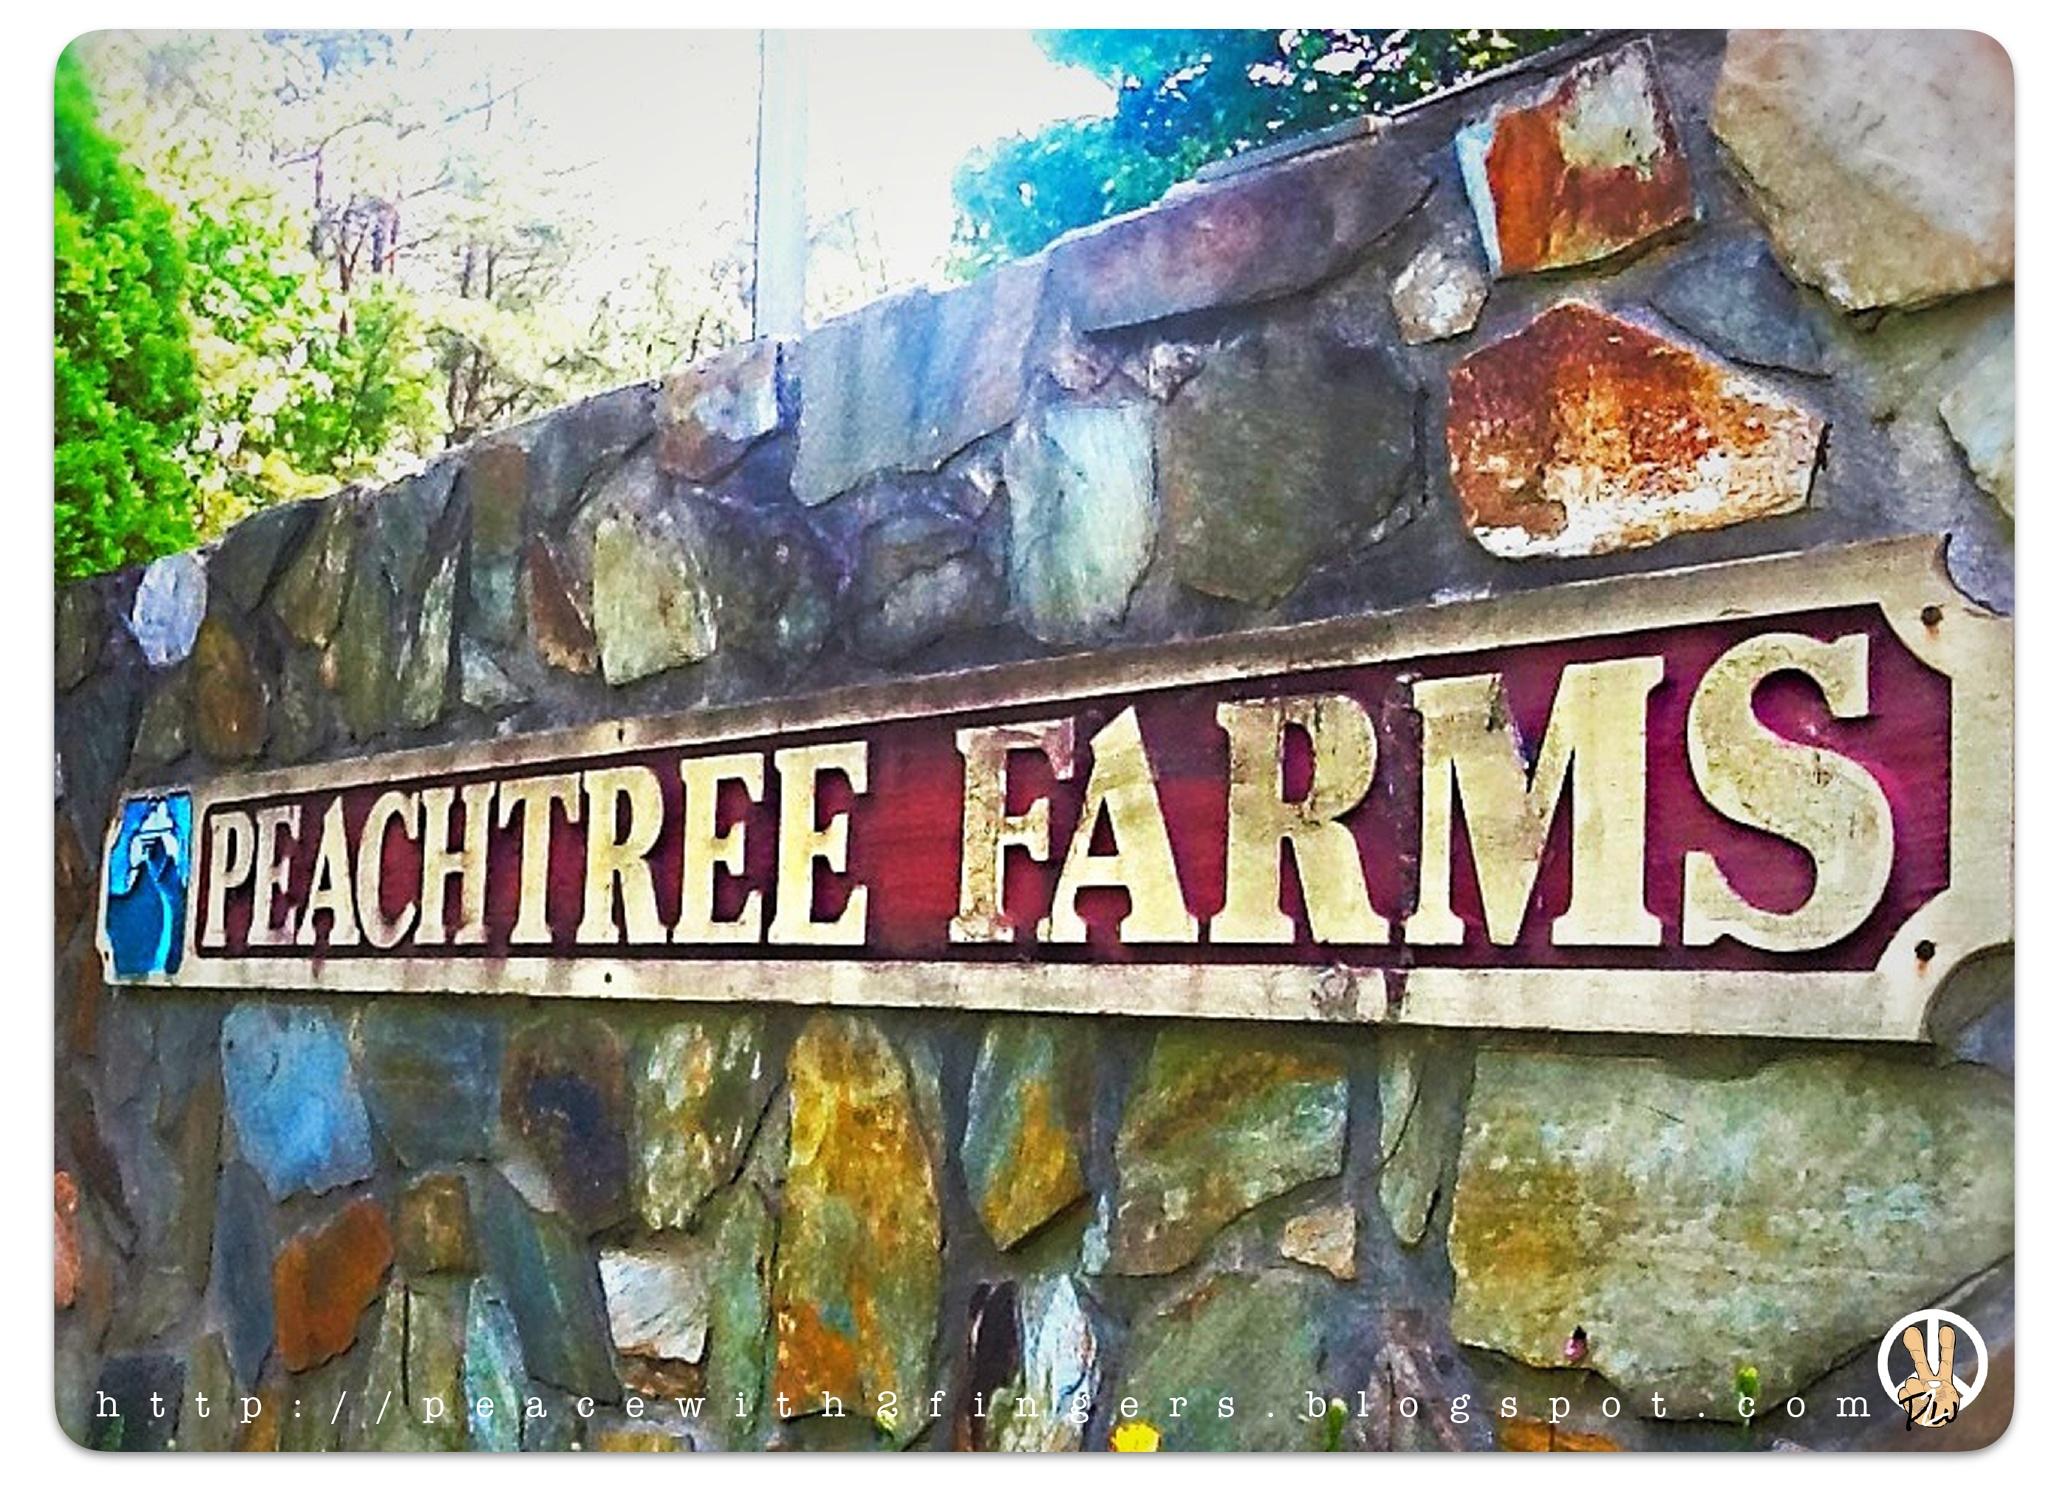 Peachtree Farms. by Darryl Weddington